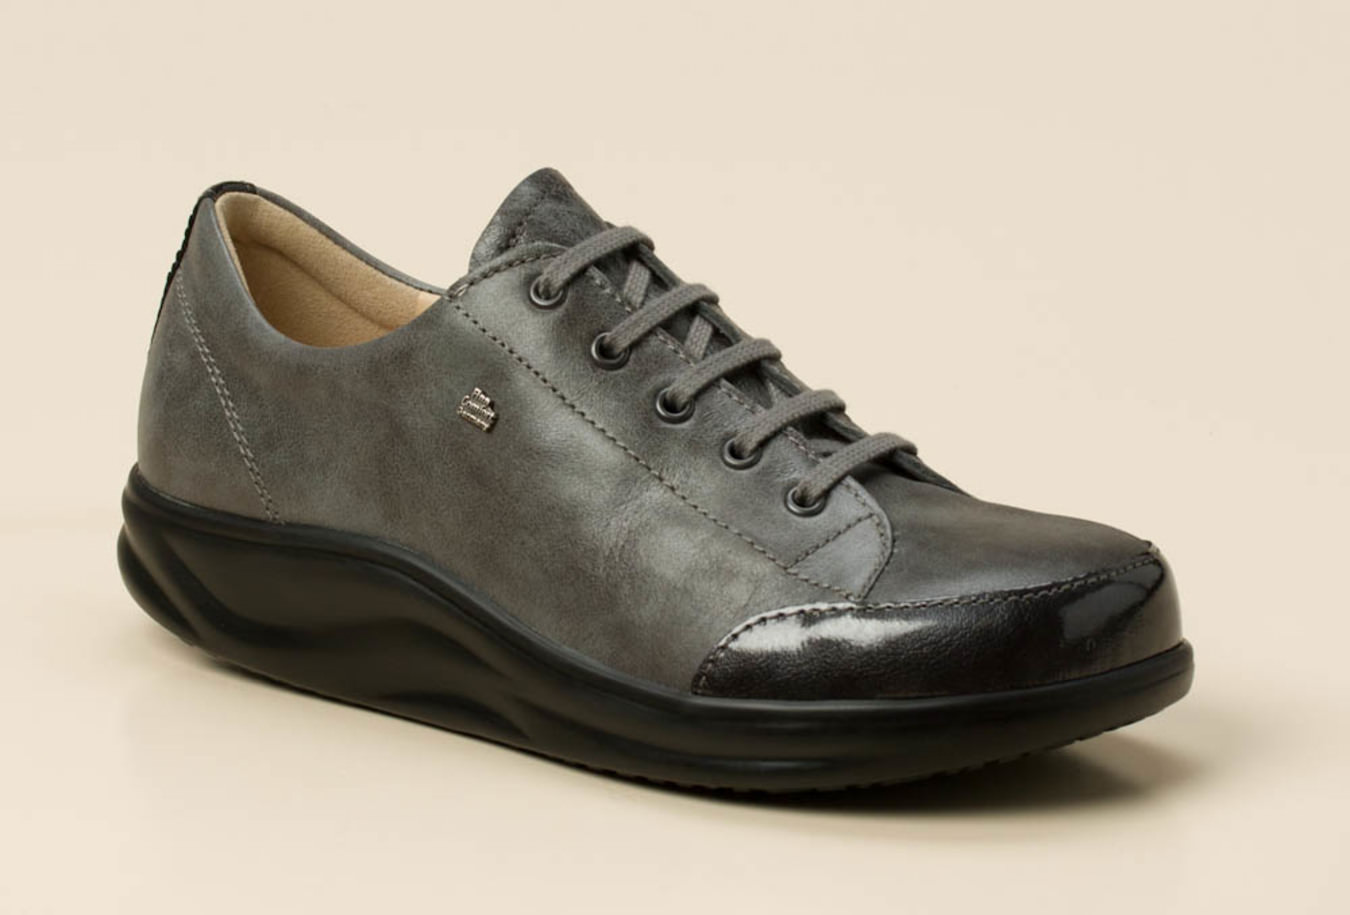 2dca5cf7d28db7 Finn Comfort Damen Schnürschuh in grau kaufen